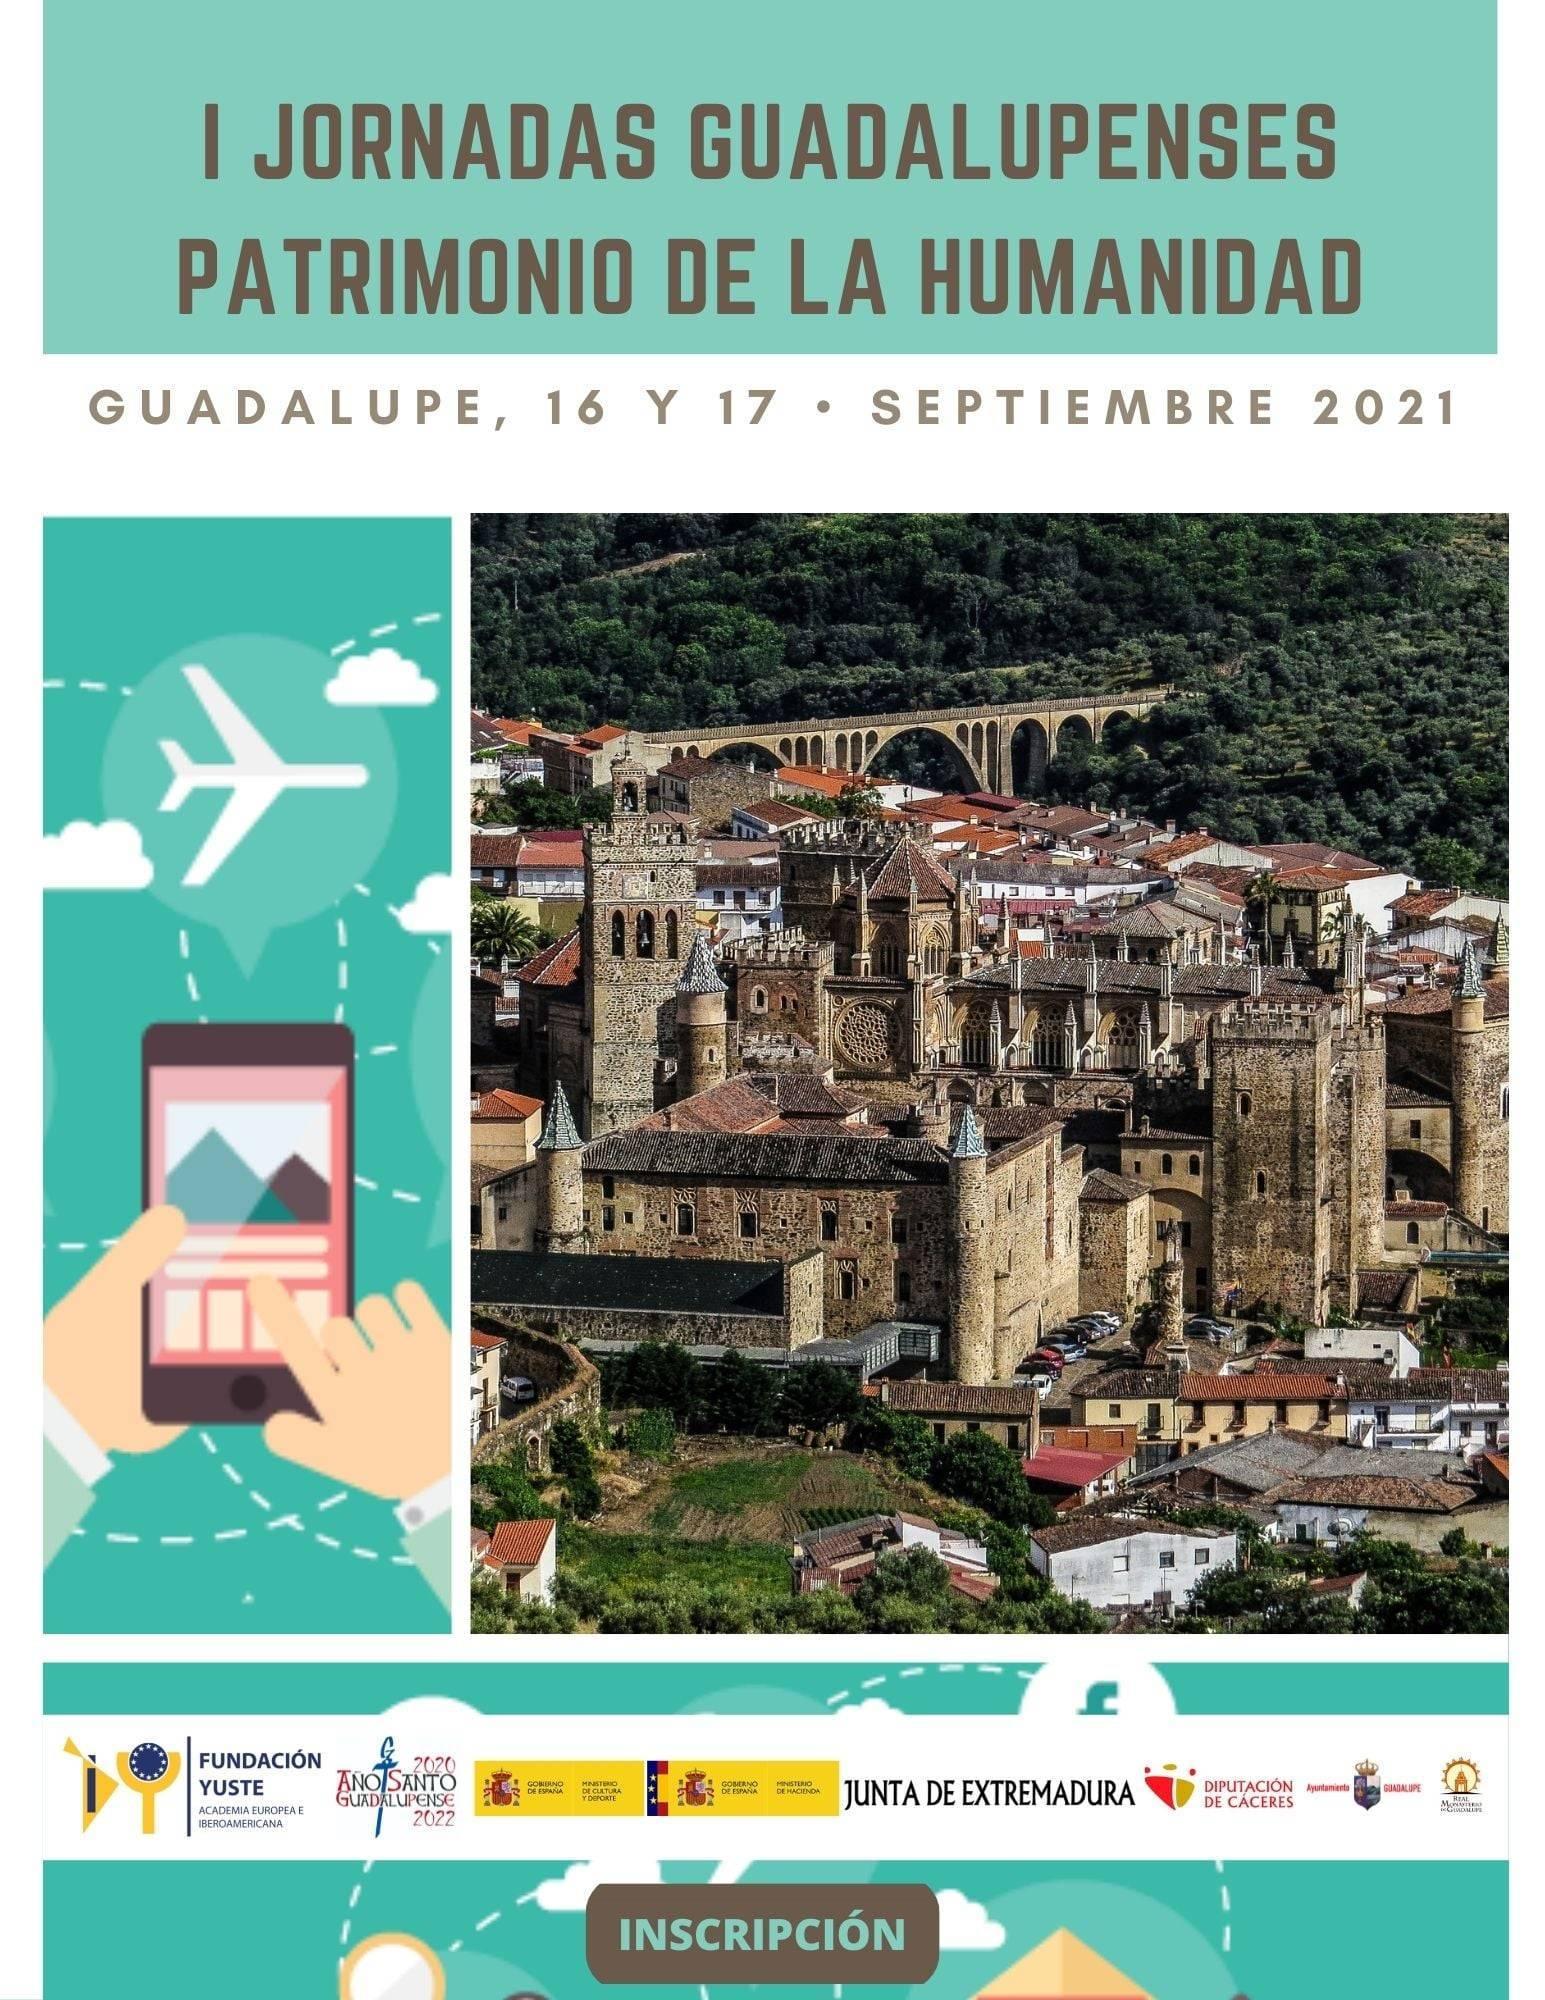 I Jornadas Guadalupenses Patrimonio de la Humanidad - Guadalupe (Cáceres)